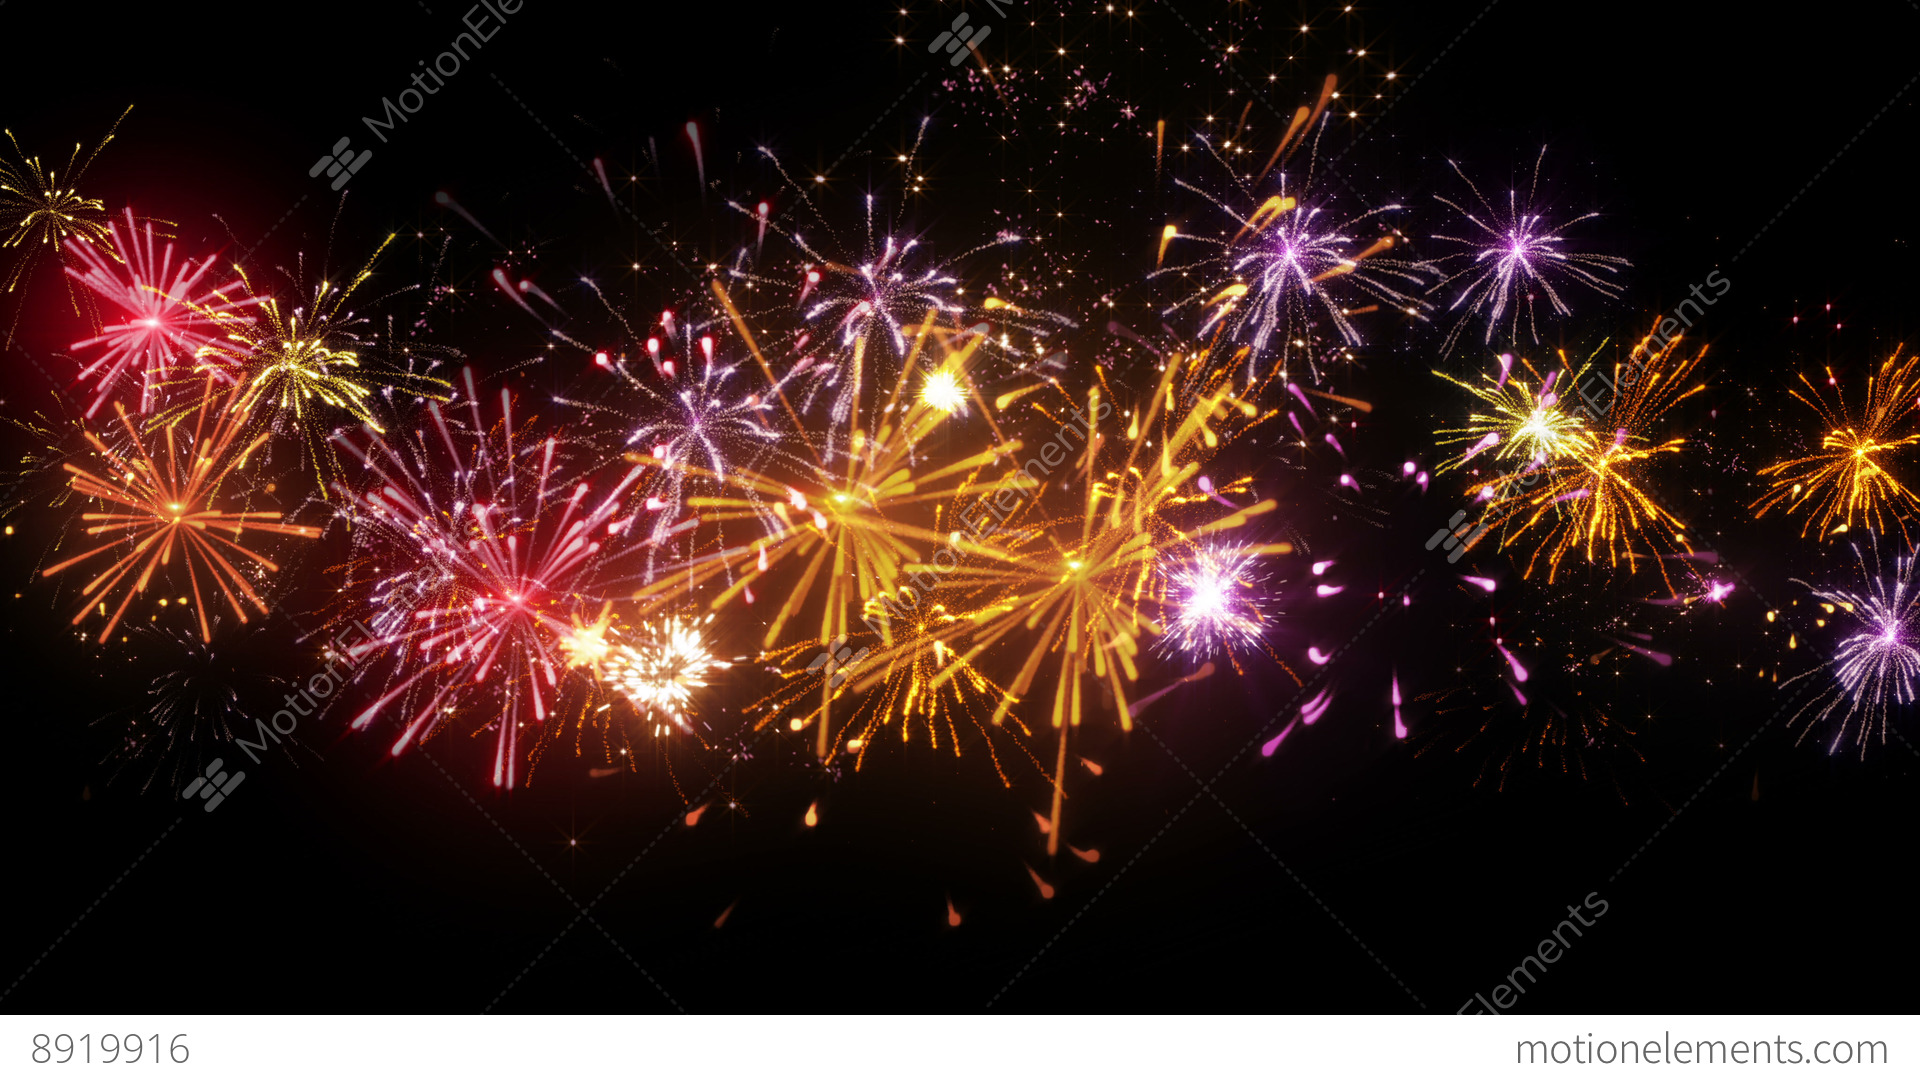 Beautiful Fireworks Seamless Loop Animation 4k (4096x2304 ...